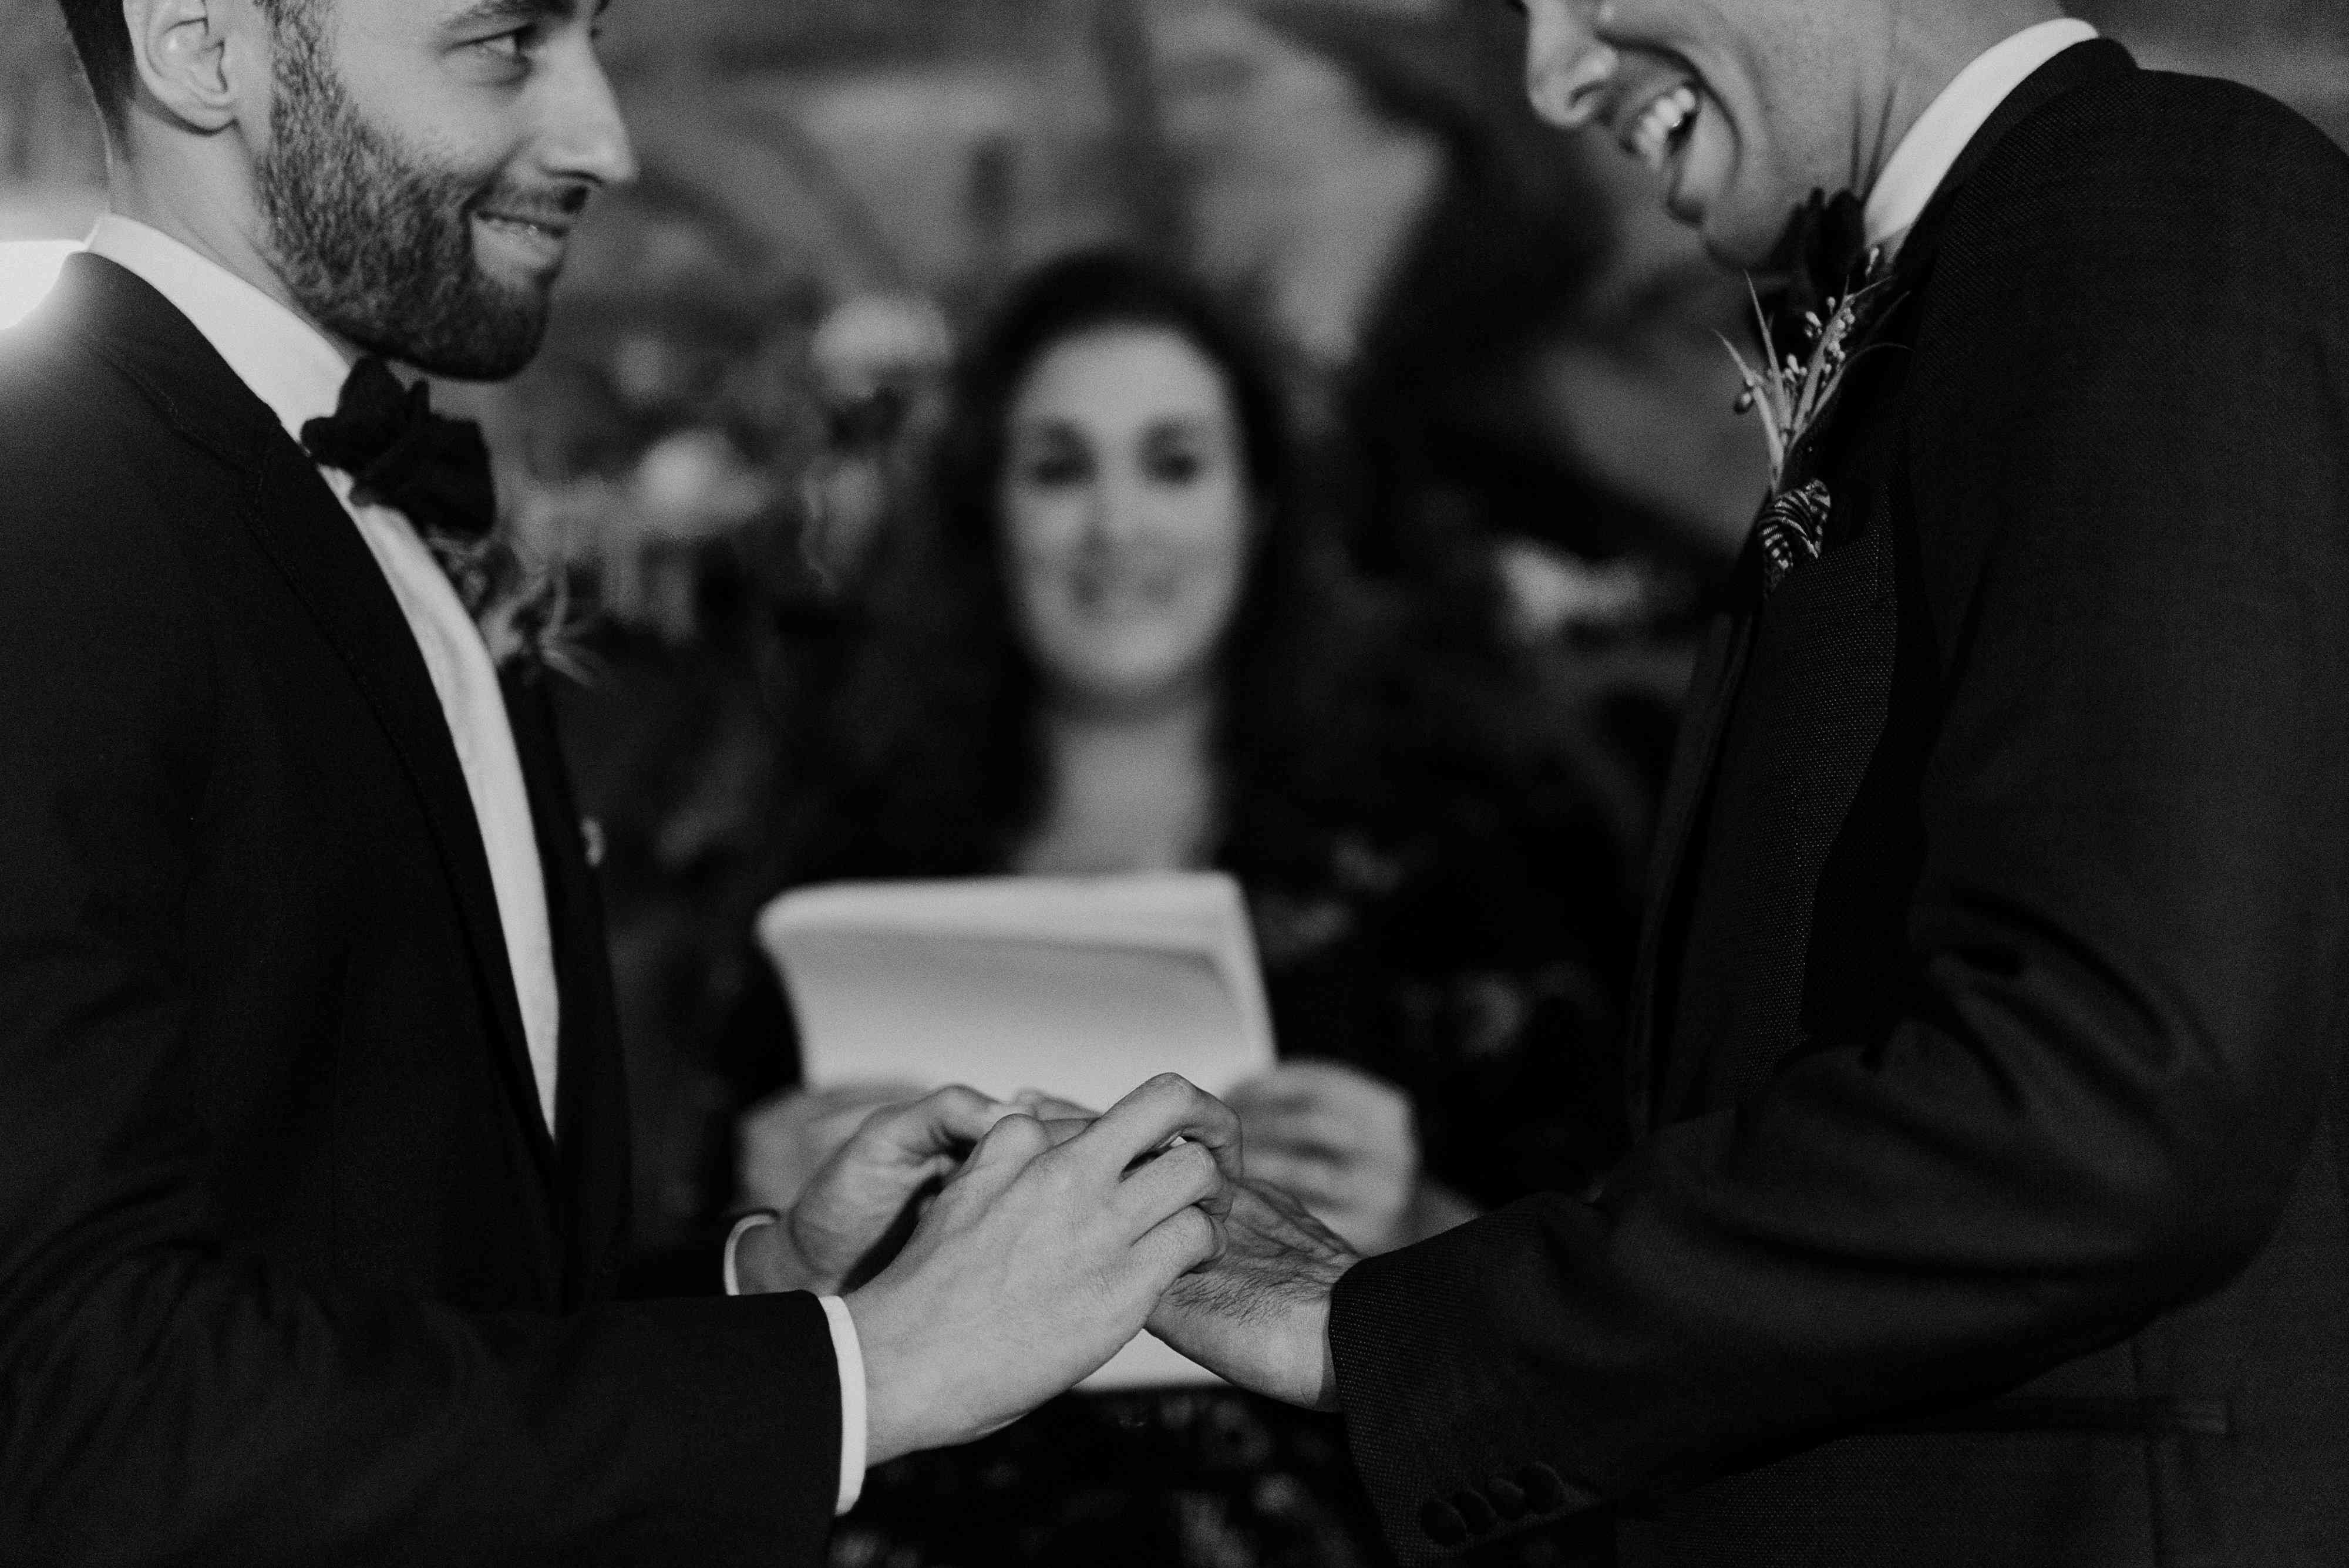 Grooms exchanging rings